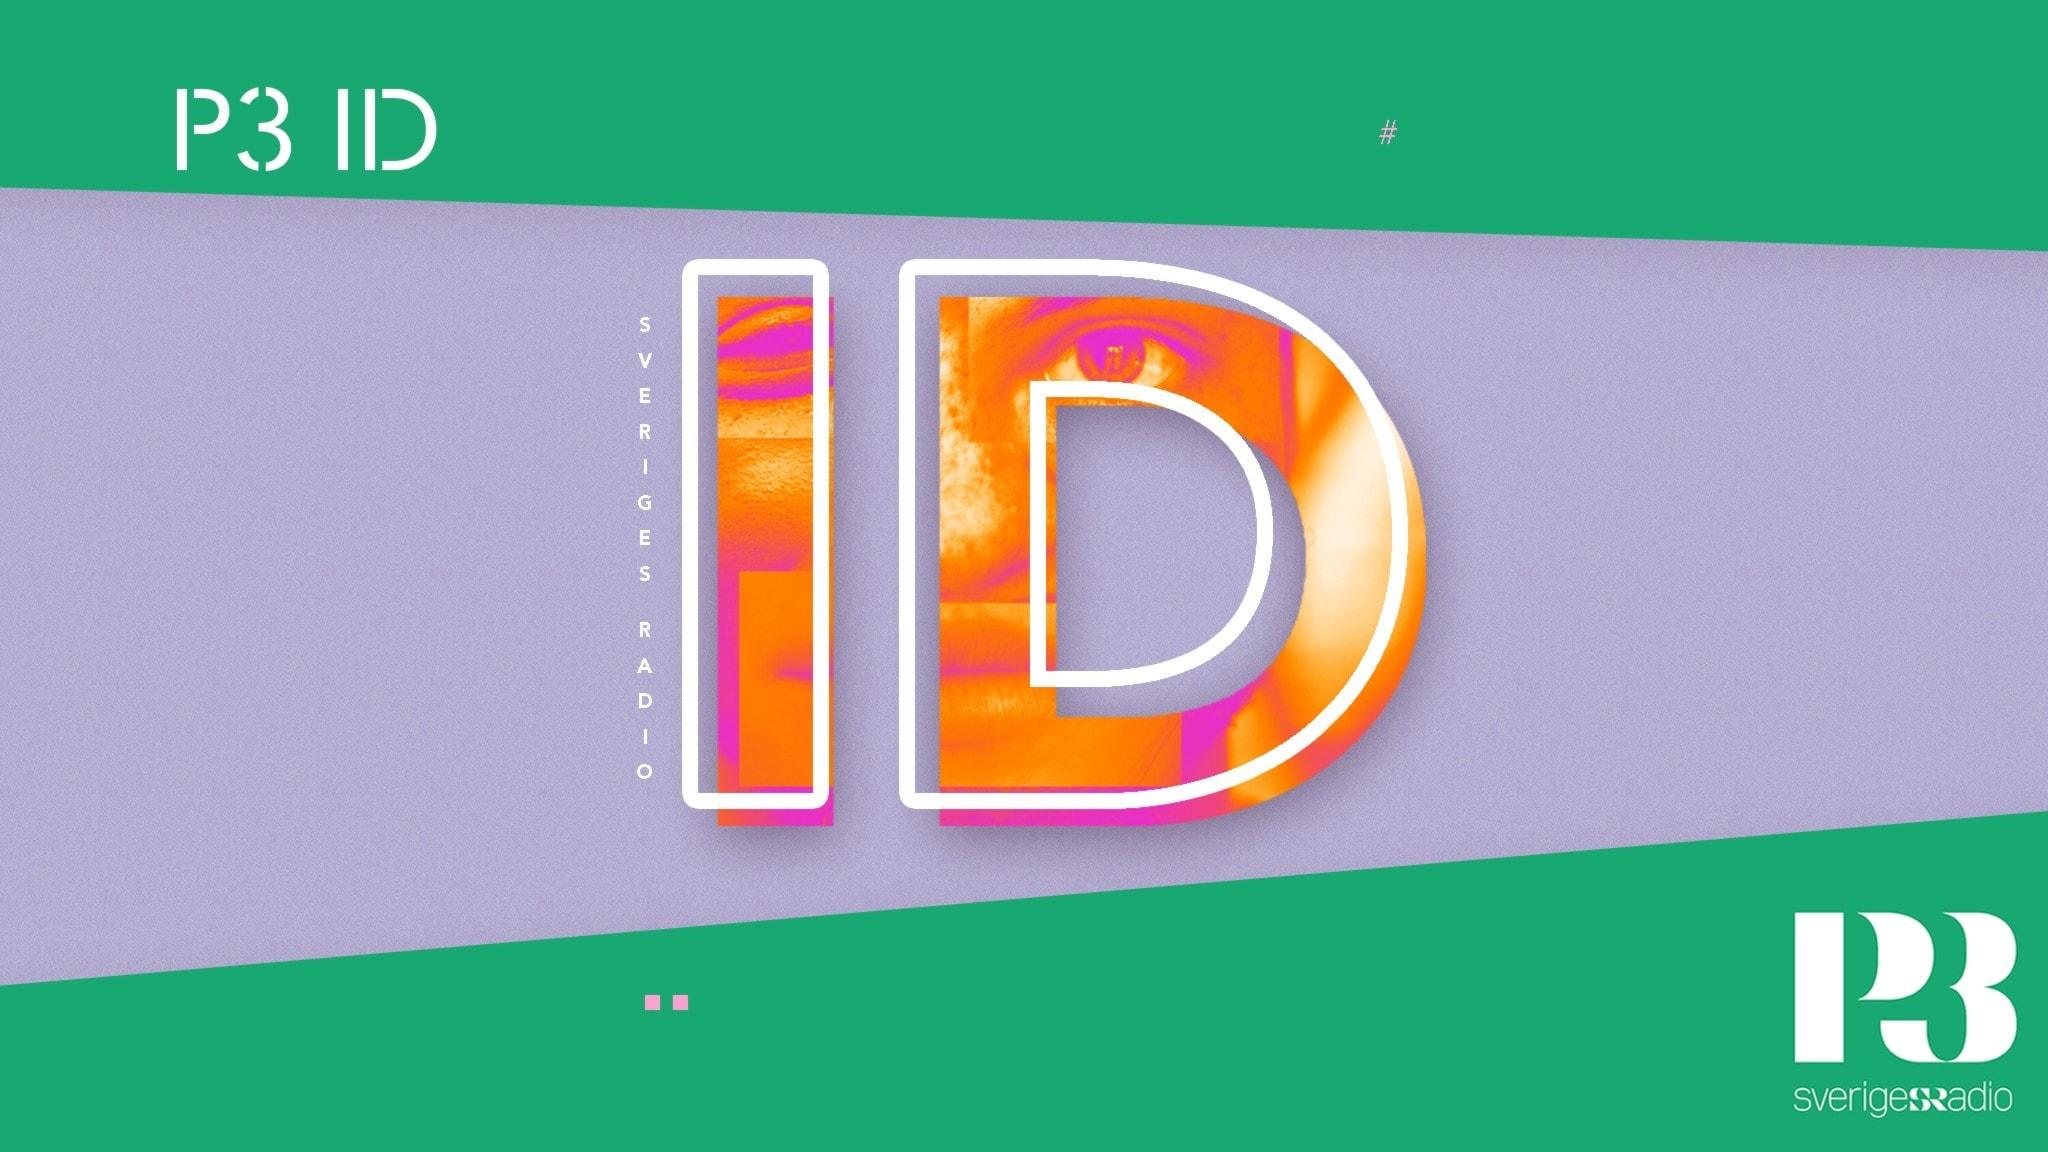 PODDTIPS: P3 ID